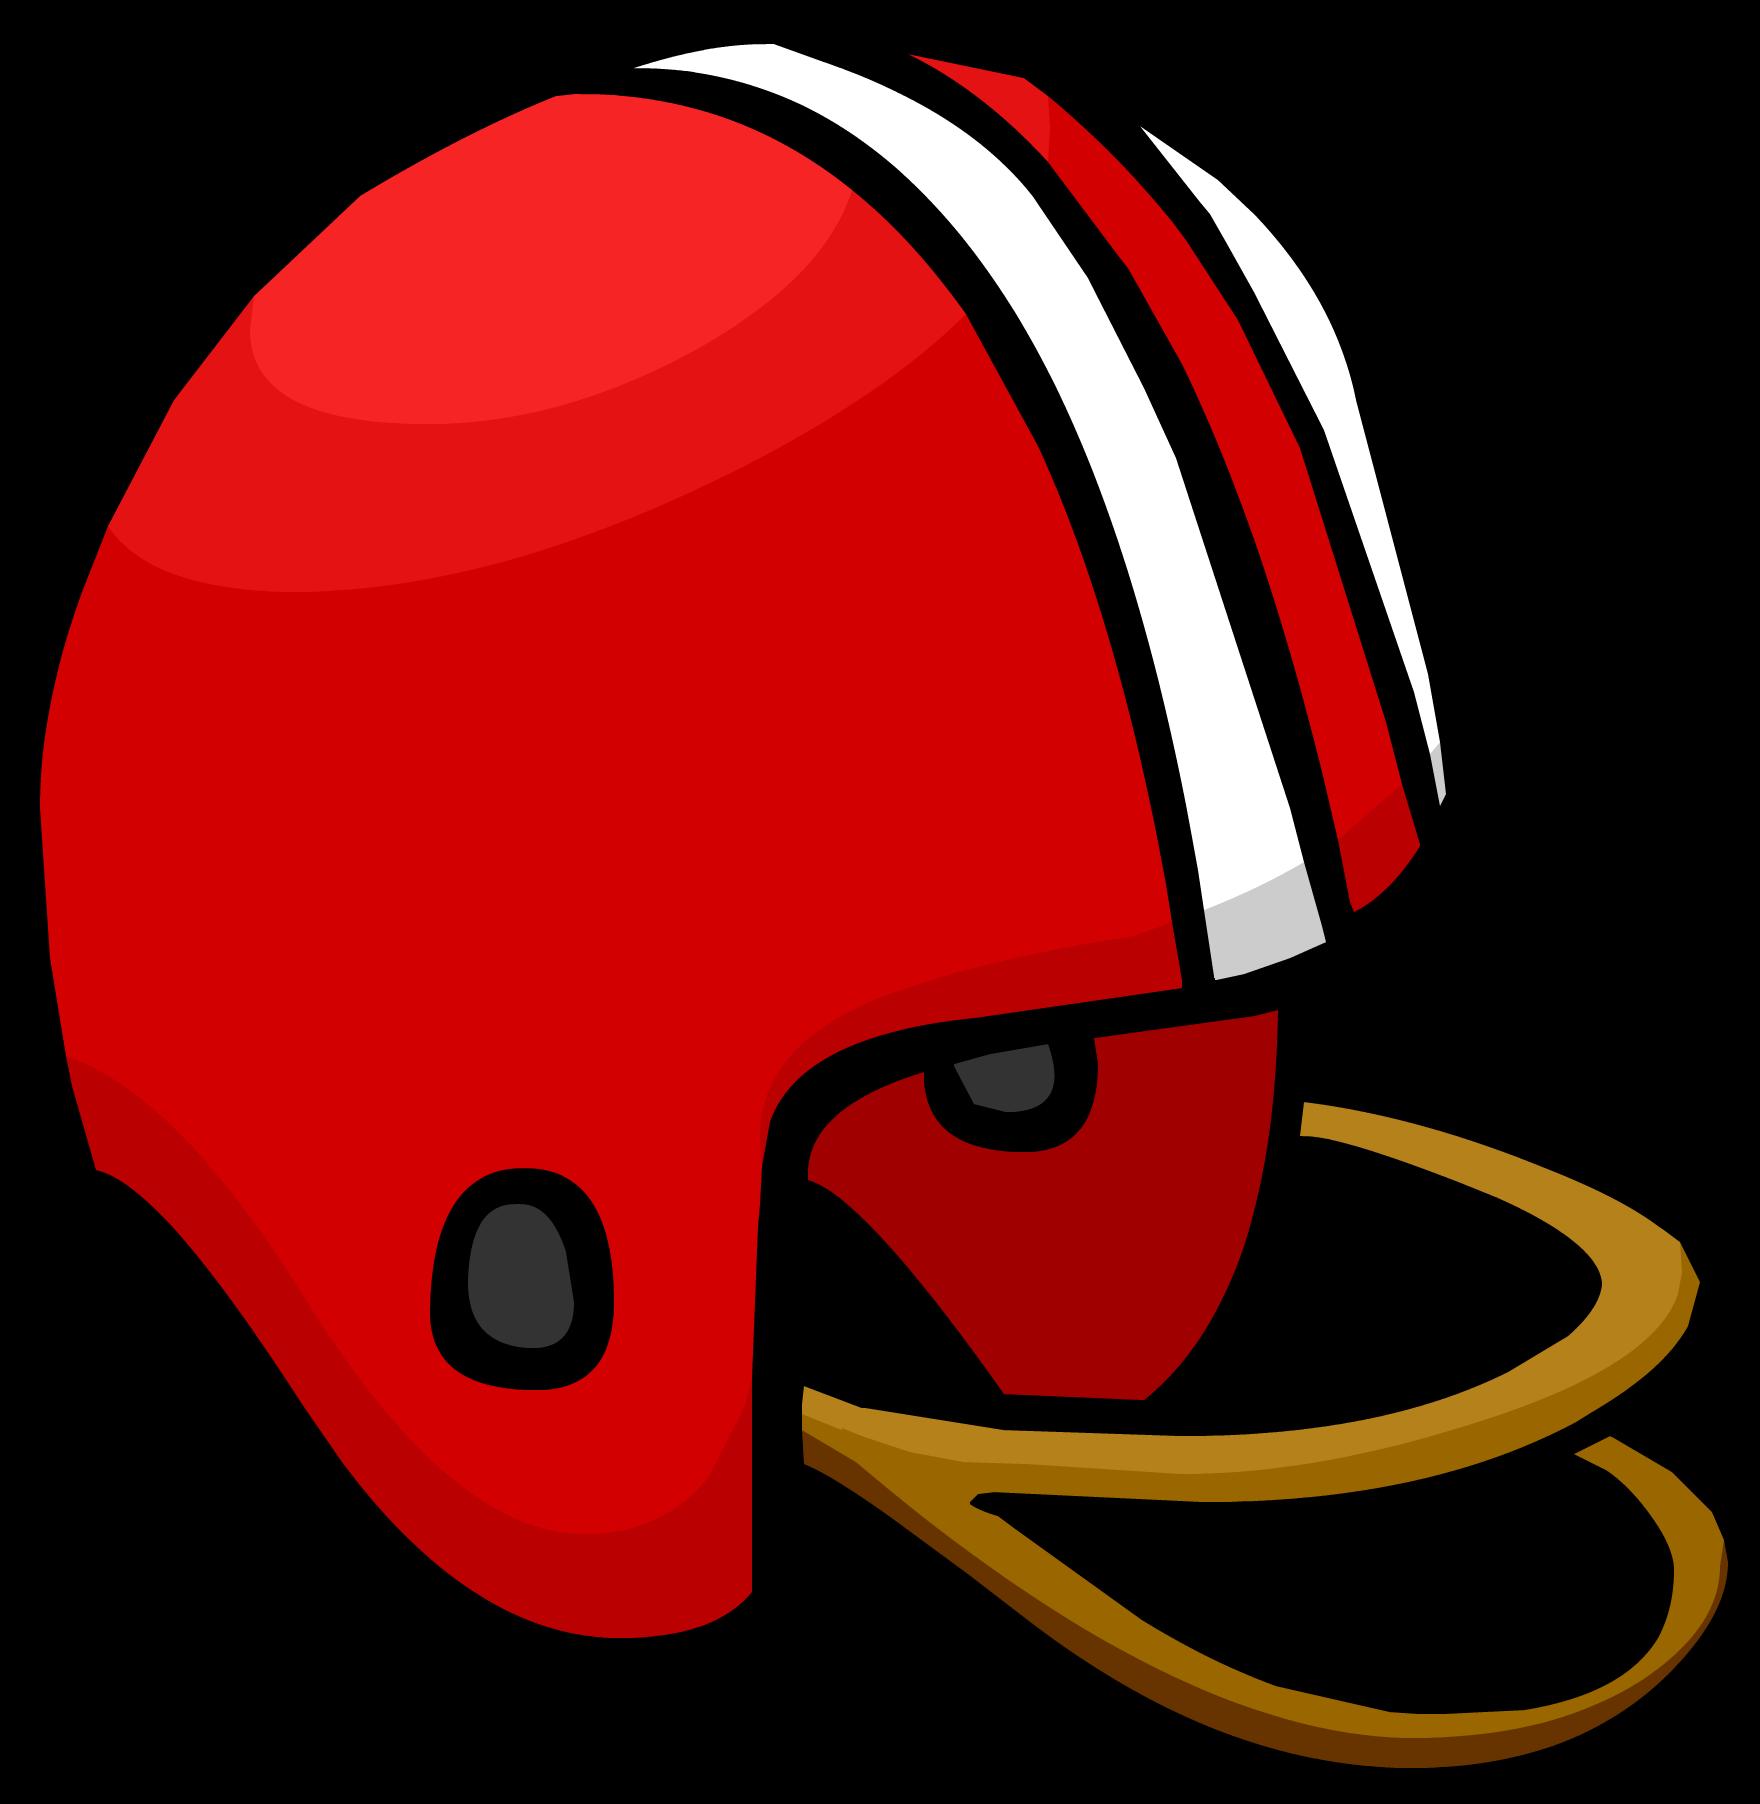 1760x1804 Red Football Helmet Clipart